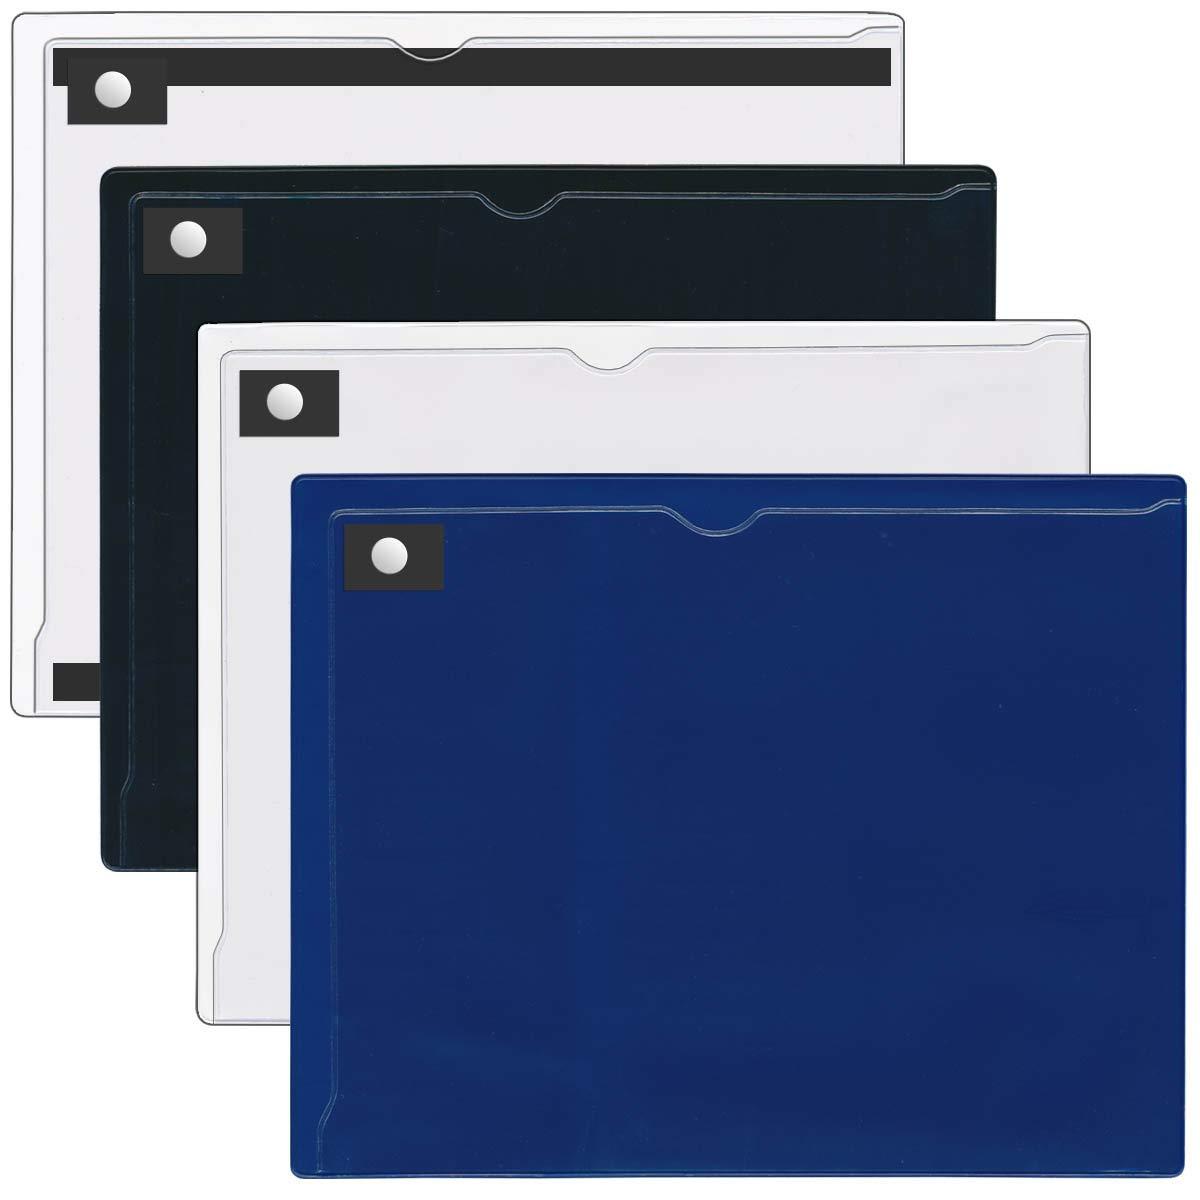 StoreSMART Magnetic Closure Pocket - Magnetic-Back - 8 1/2'' x 11'' - 16 Piece Variety Pack - MCP8511MB-VP16